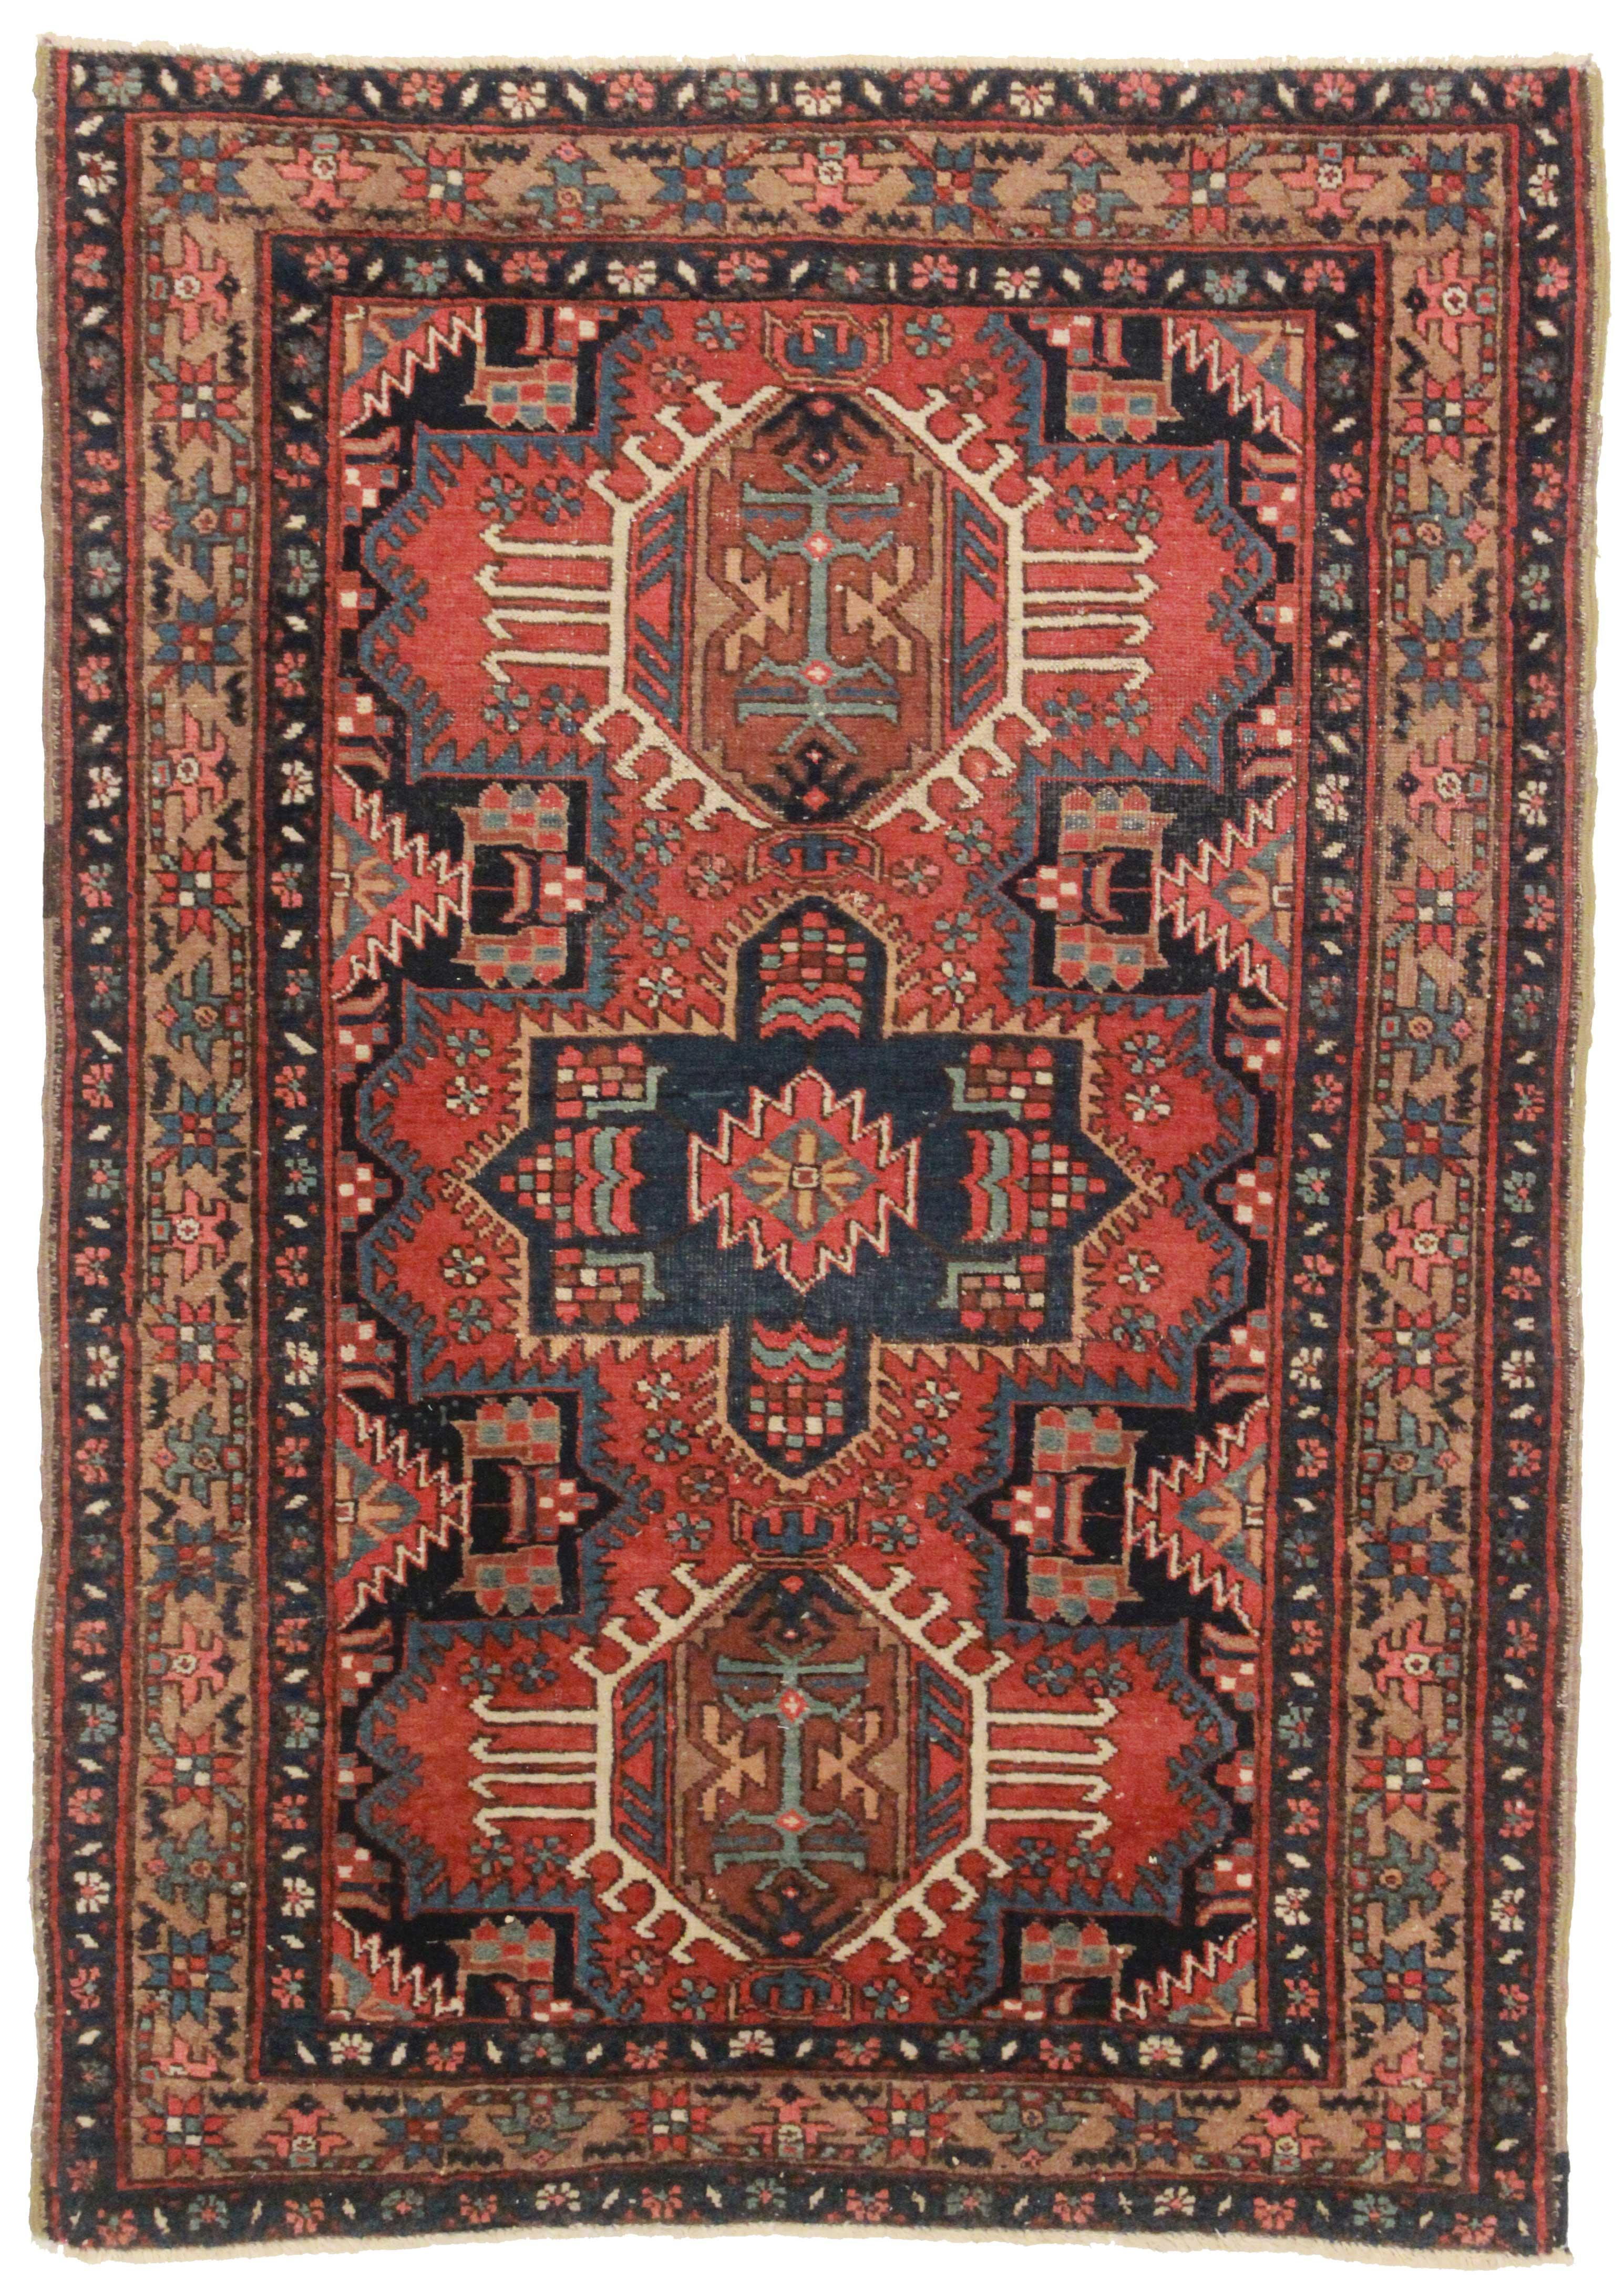 3 X 5 Antique Persian Karajeh Rug 13838 Exclusive Oriental Rugs